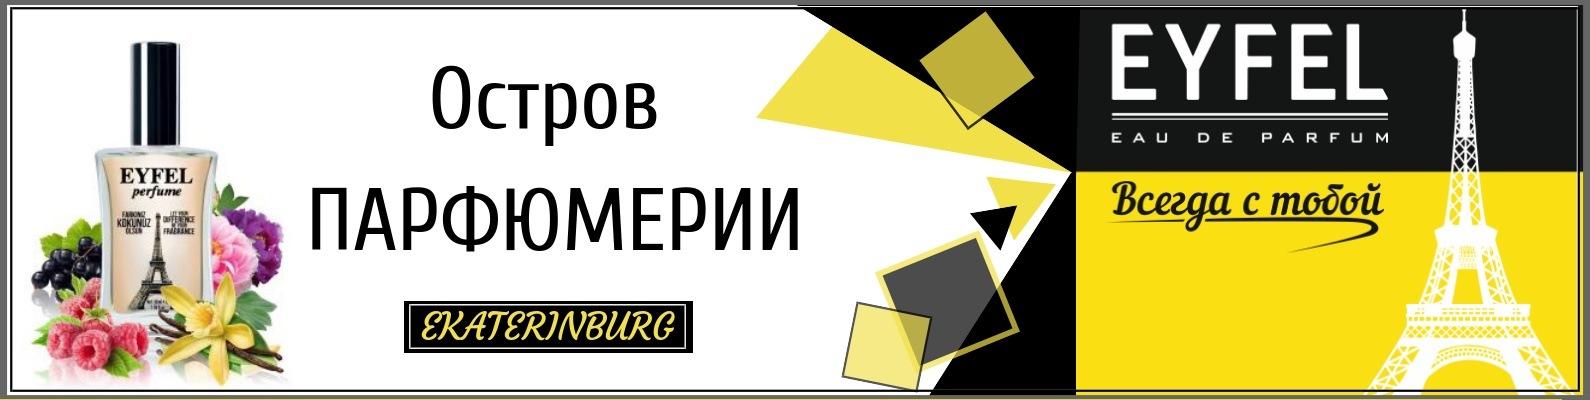 Eyfel Parfum екатеринбург вконтакте